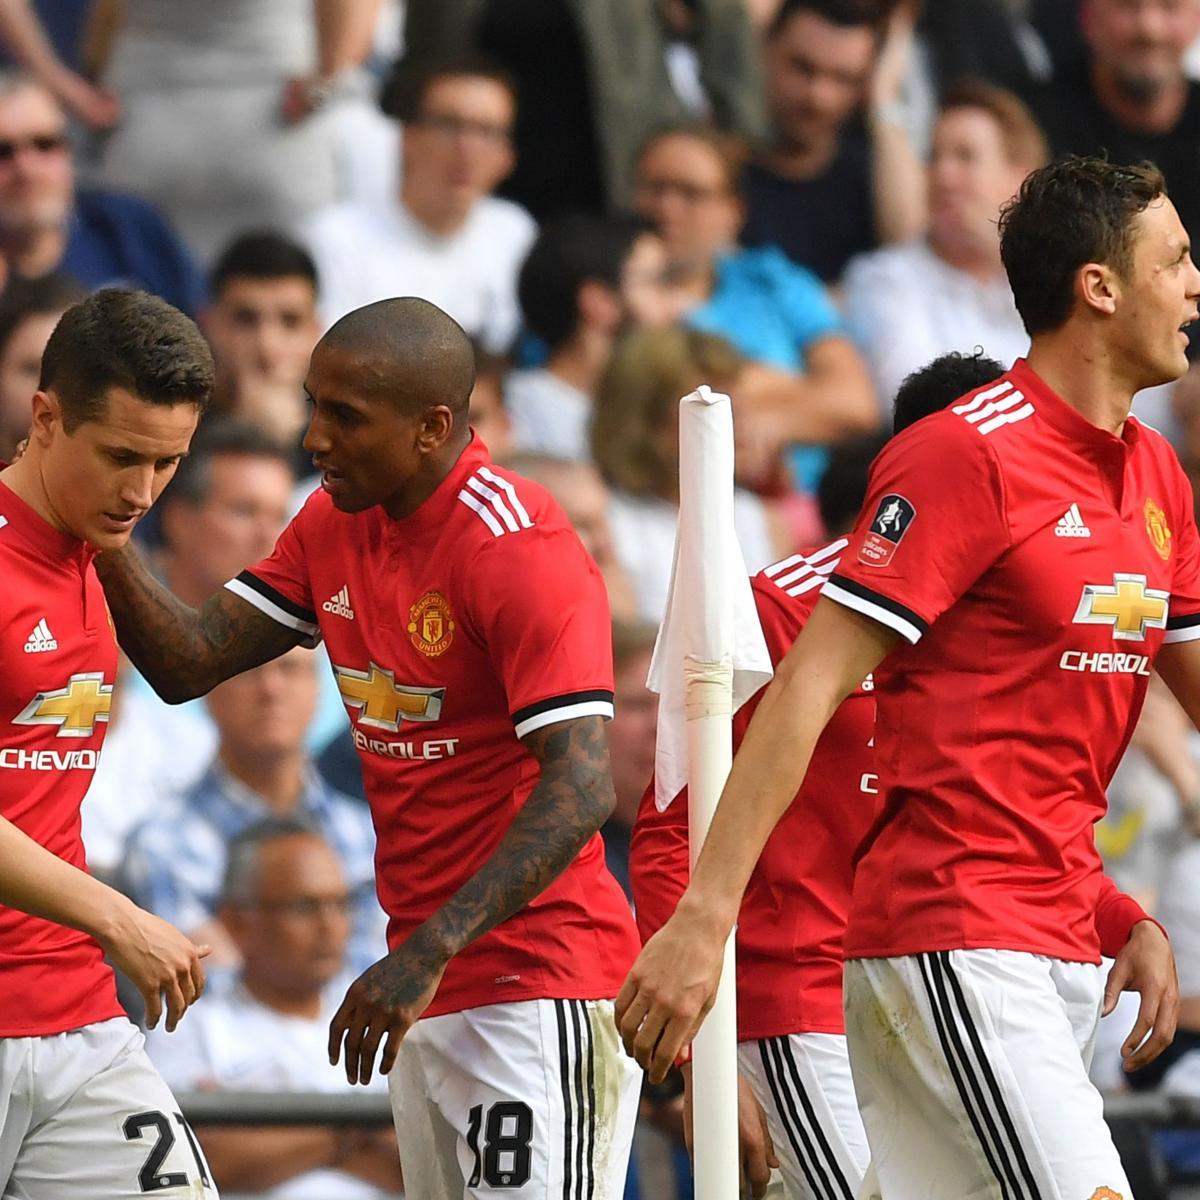 Tottenham Hotspur Vs Man United Tickets: Ander Herrera Caps Manchester United Comeback Vs